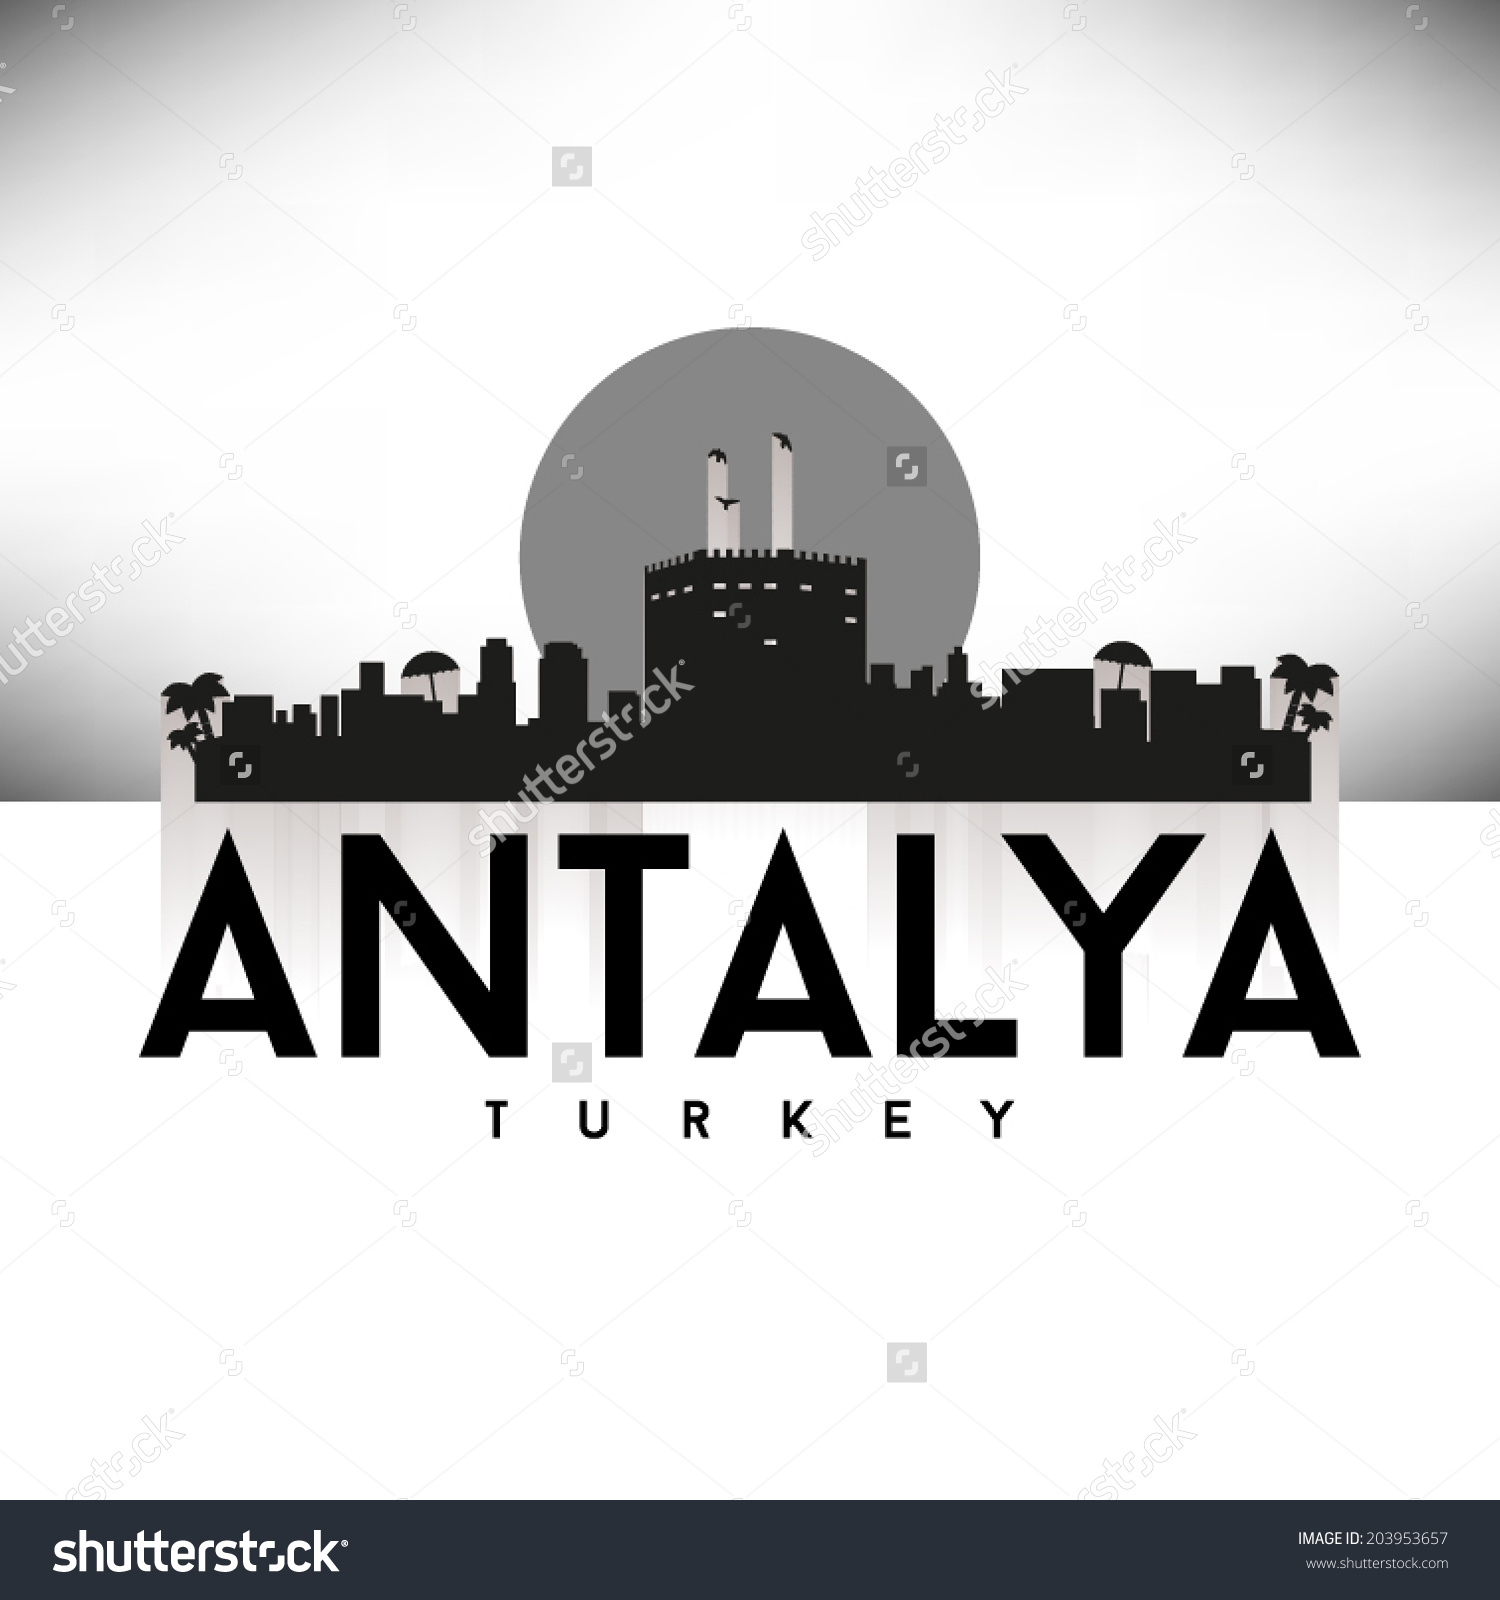 Antalya Turkey Skyline Silhouette Design Vector Stock Vector.